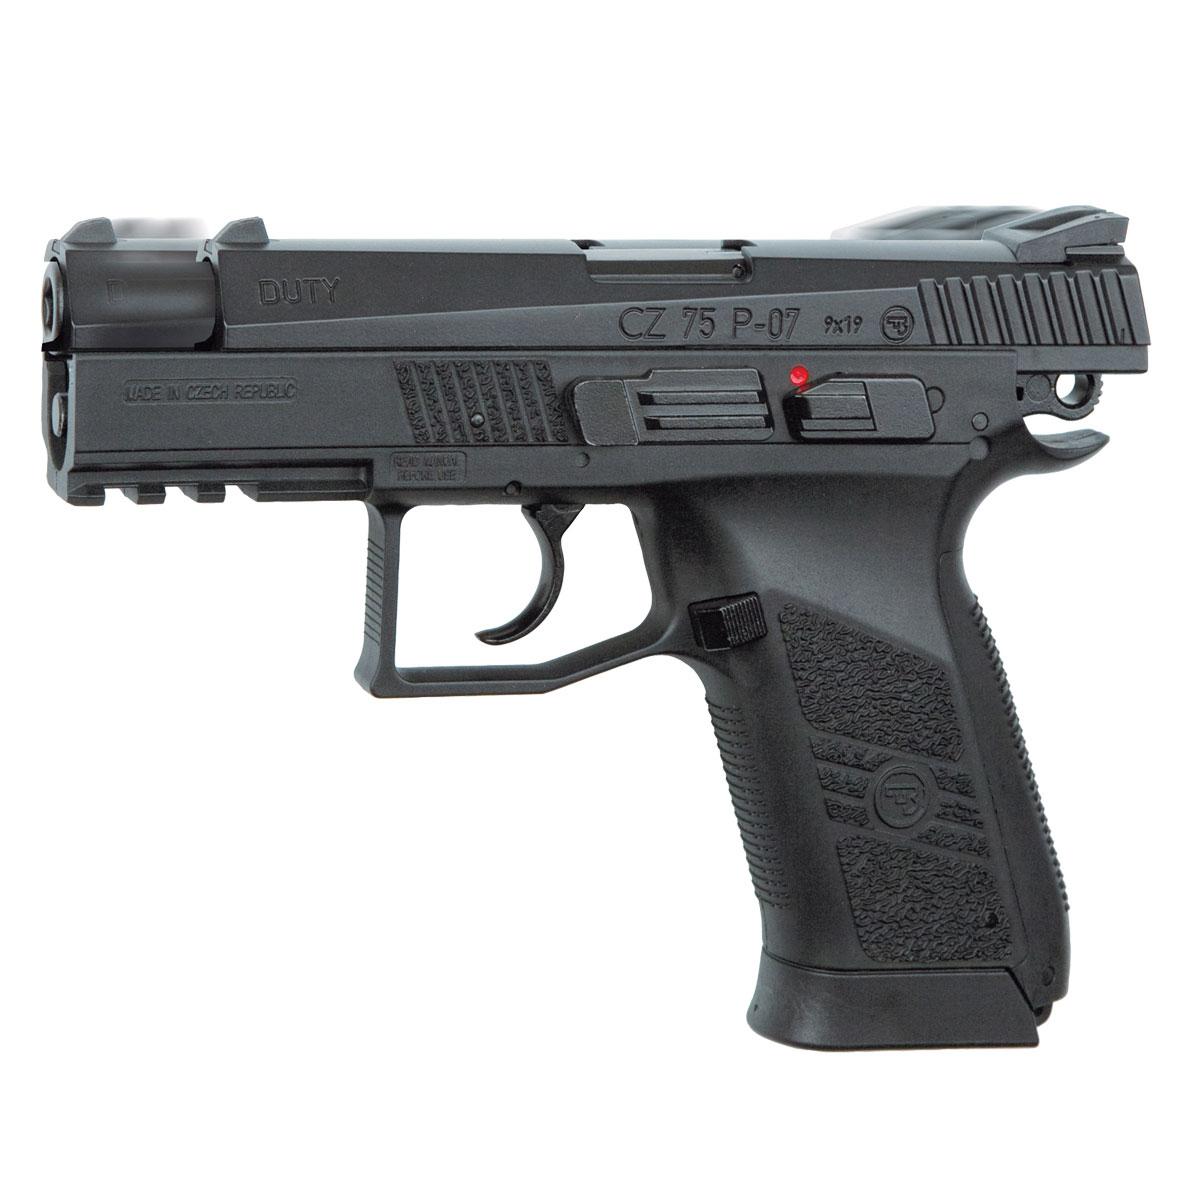 "ASG ASG ""CZ 75 P-07 Duty"" пистолет пневматический, Blowback, CO2, 4,5 мм, цвет: Black (16728)"